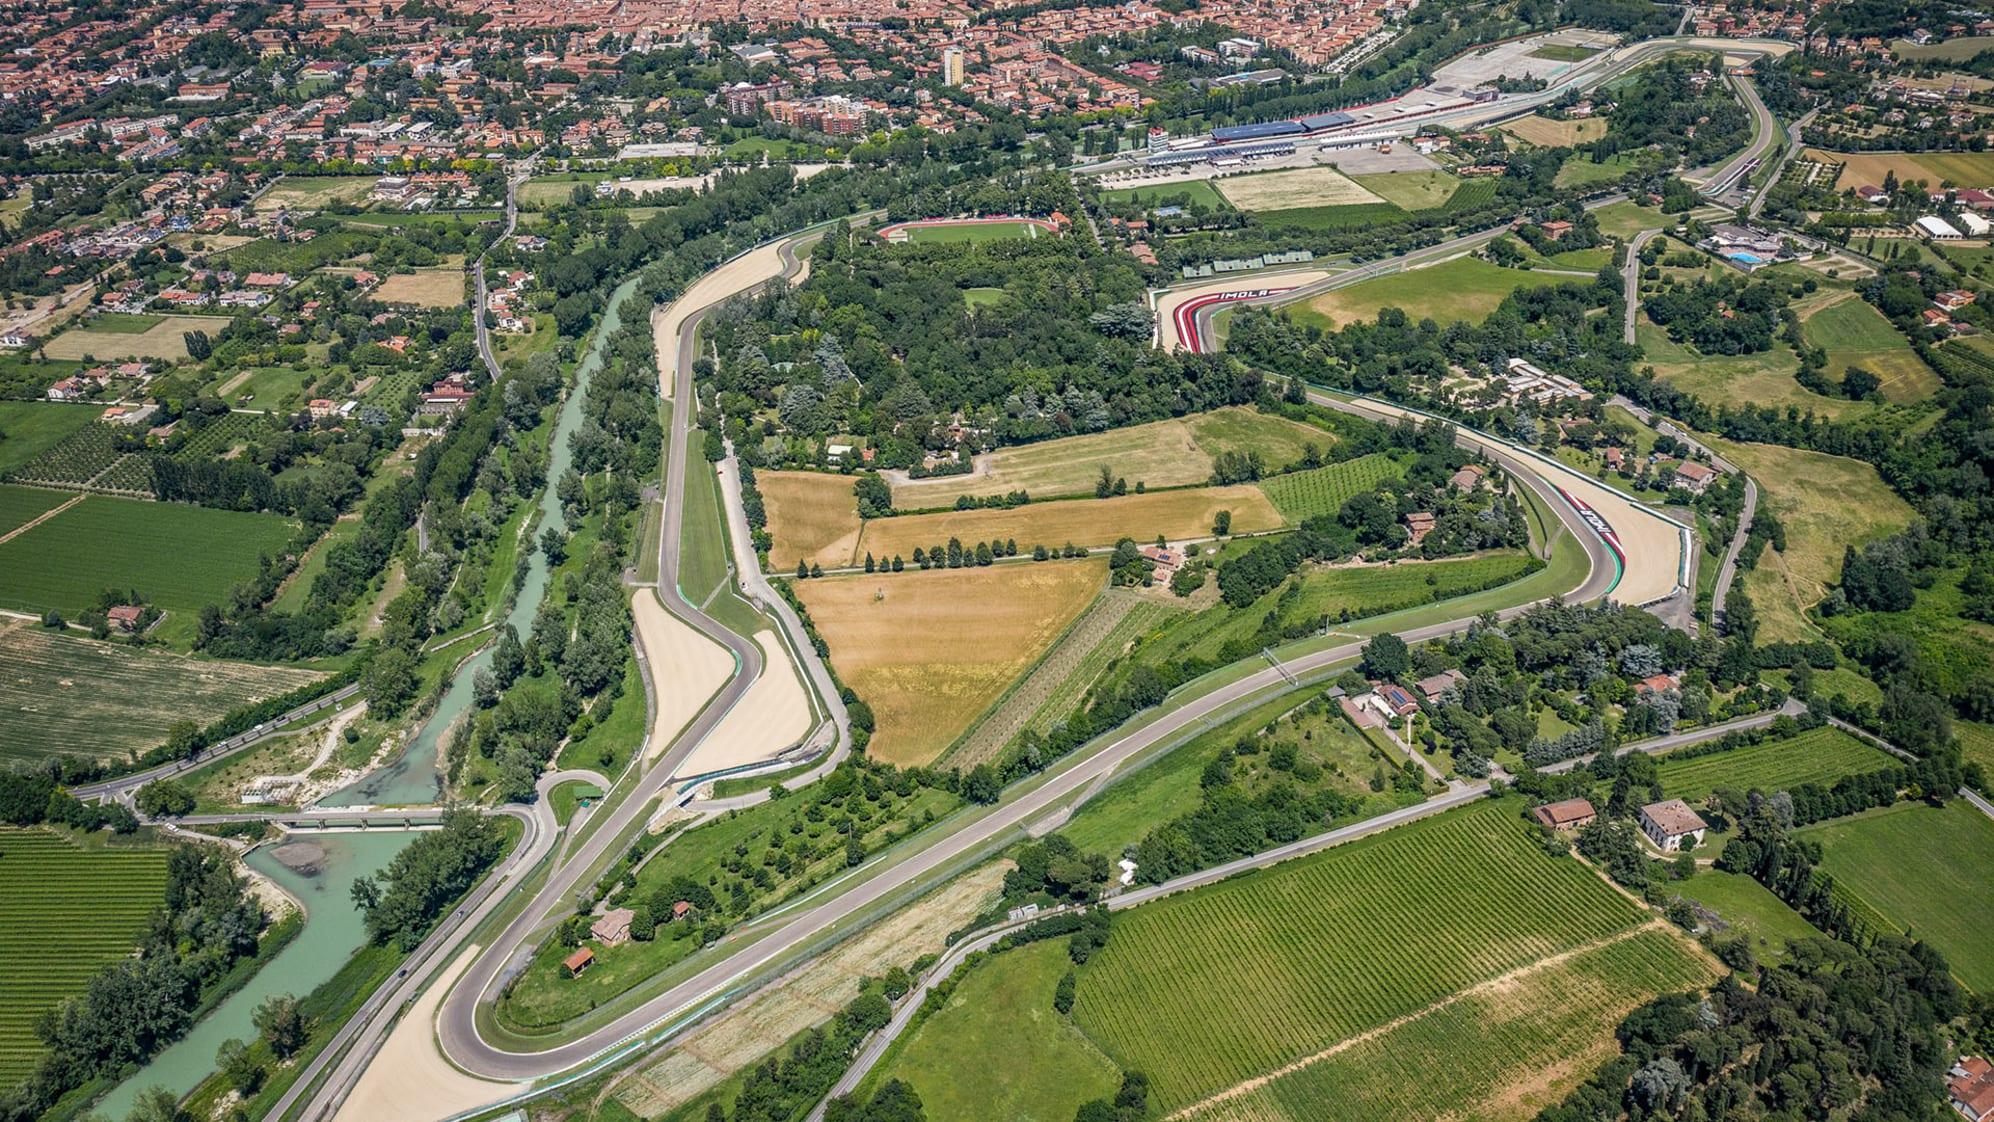 GRAND PRIX D'ÉMILIE-ROMAGNE 2020 — Formula 1 Emirates Gran Premio Dell'emilia Romagna 2020 Image